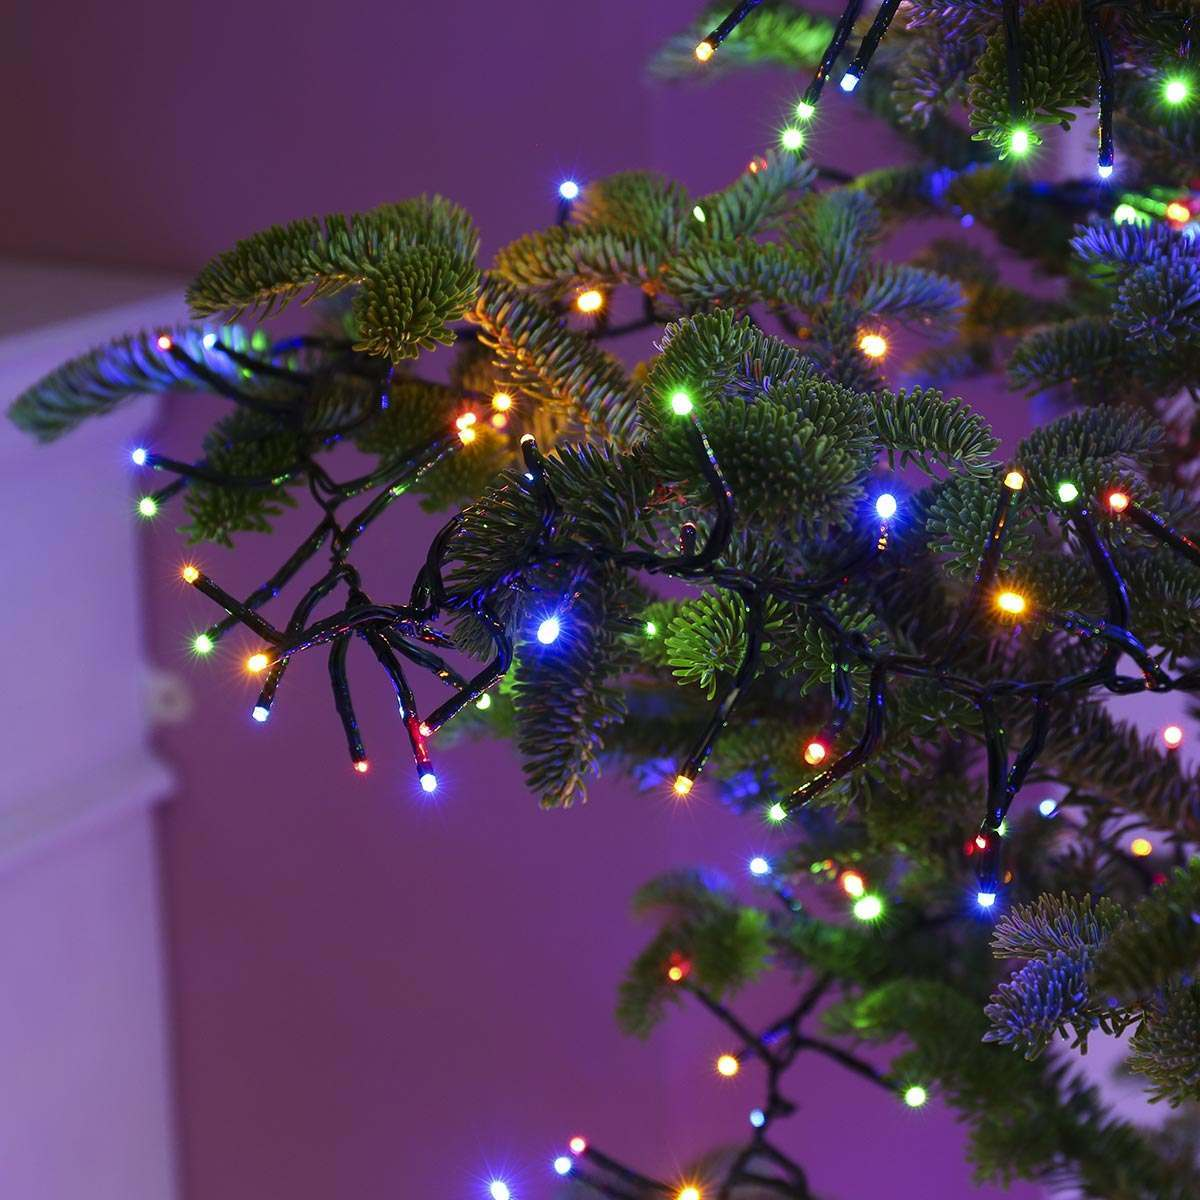 Purple Christmas Tree Lights.10m Christmas Tree Cluster Lights 800 Leds